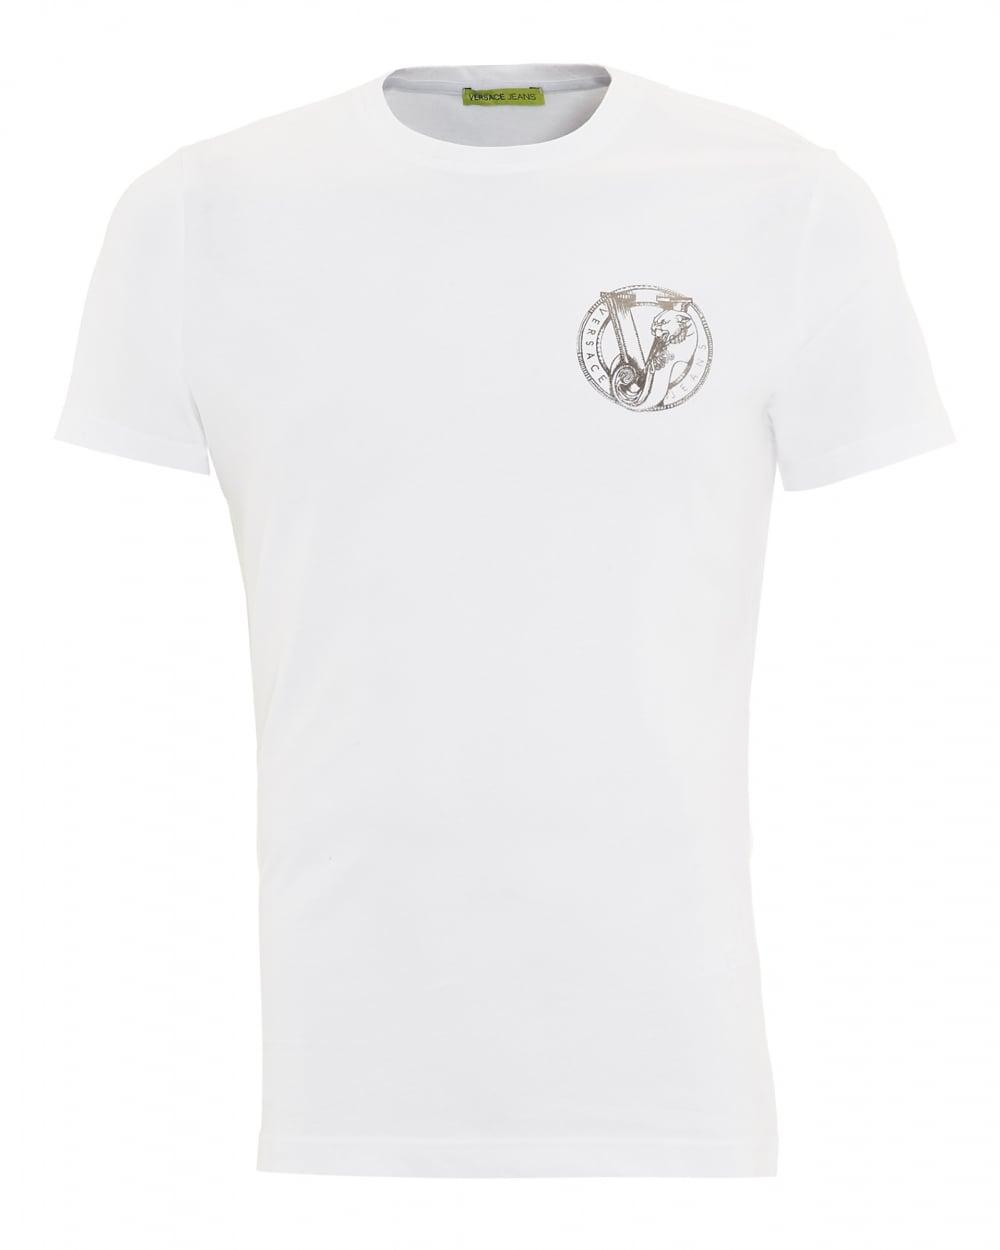 plain white versace t shirt